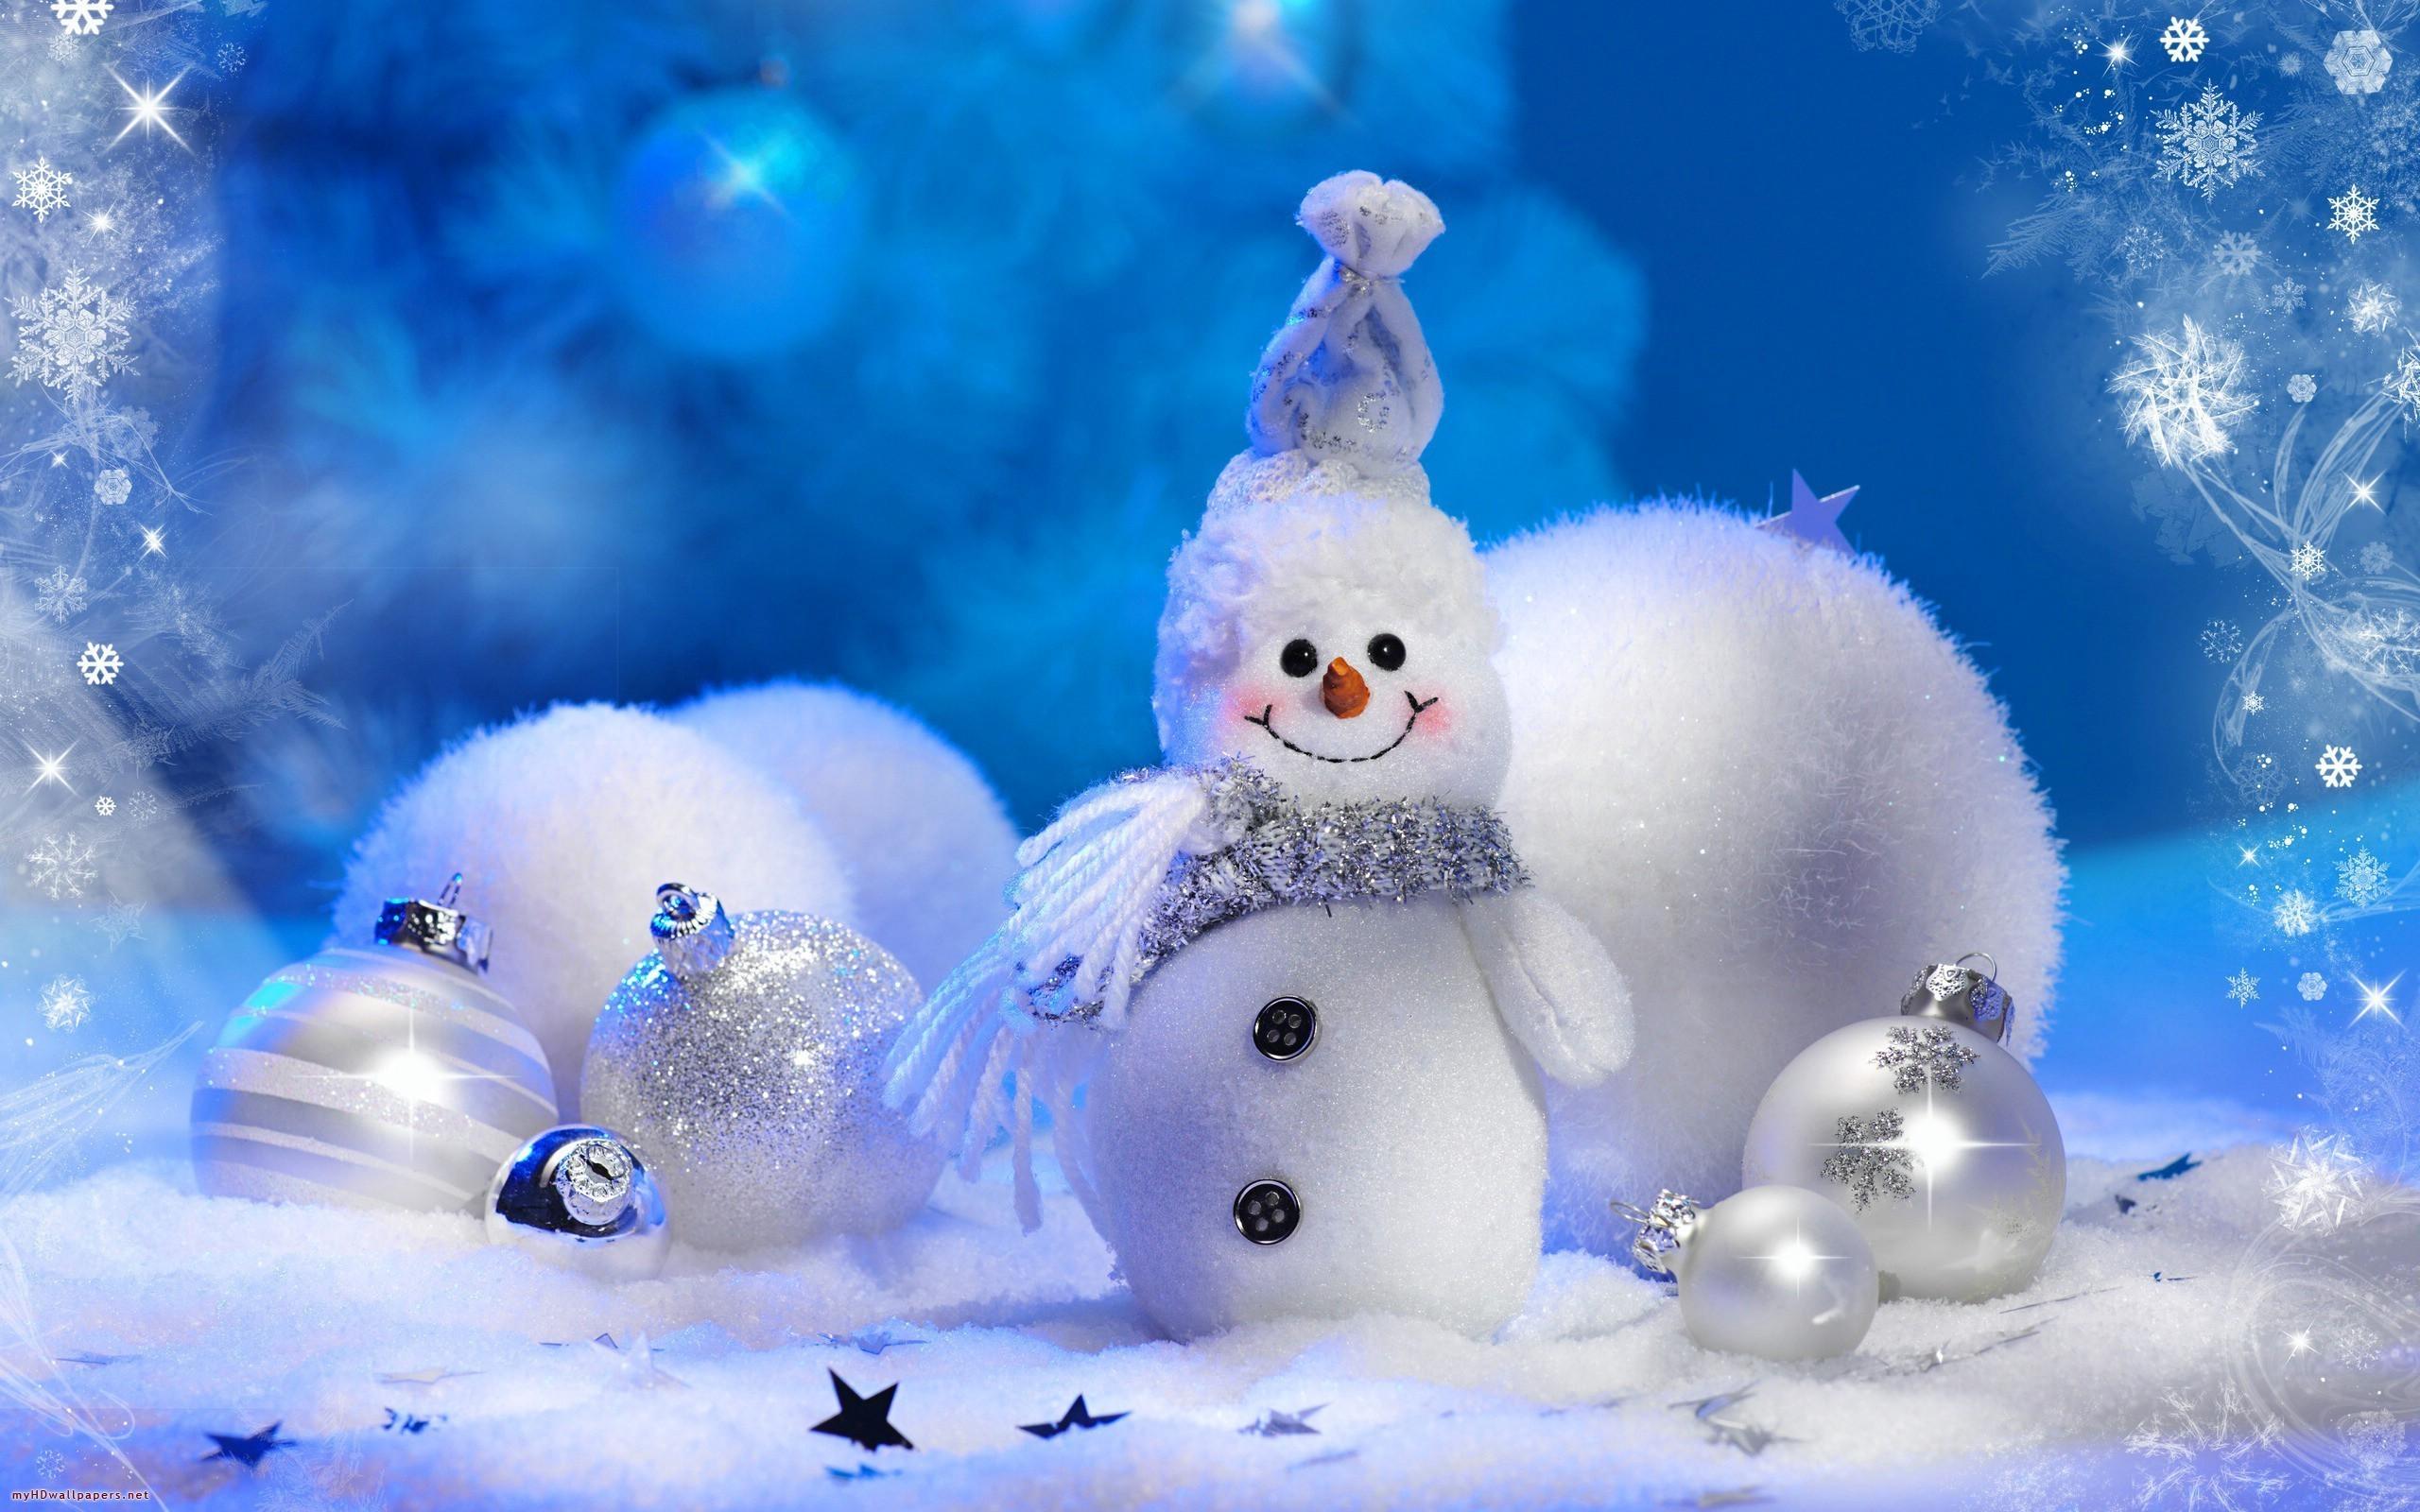 Christmas Desktop Pictures.Christmas Desktop Backgrounds 60 Images